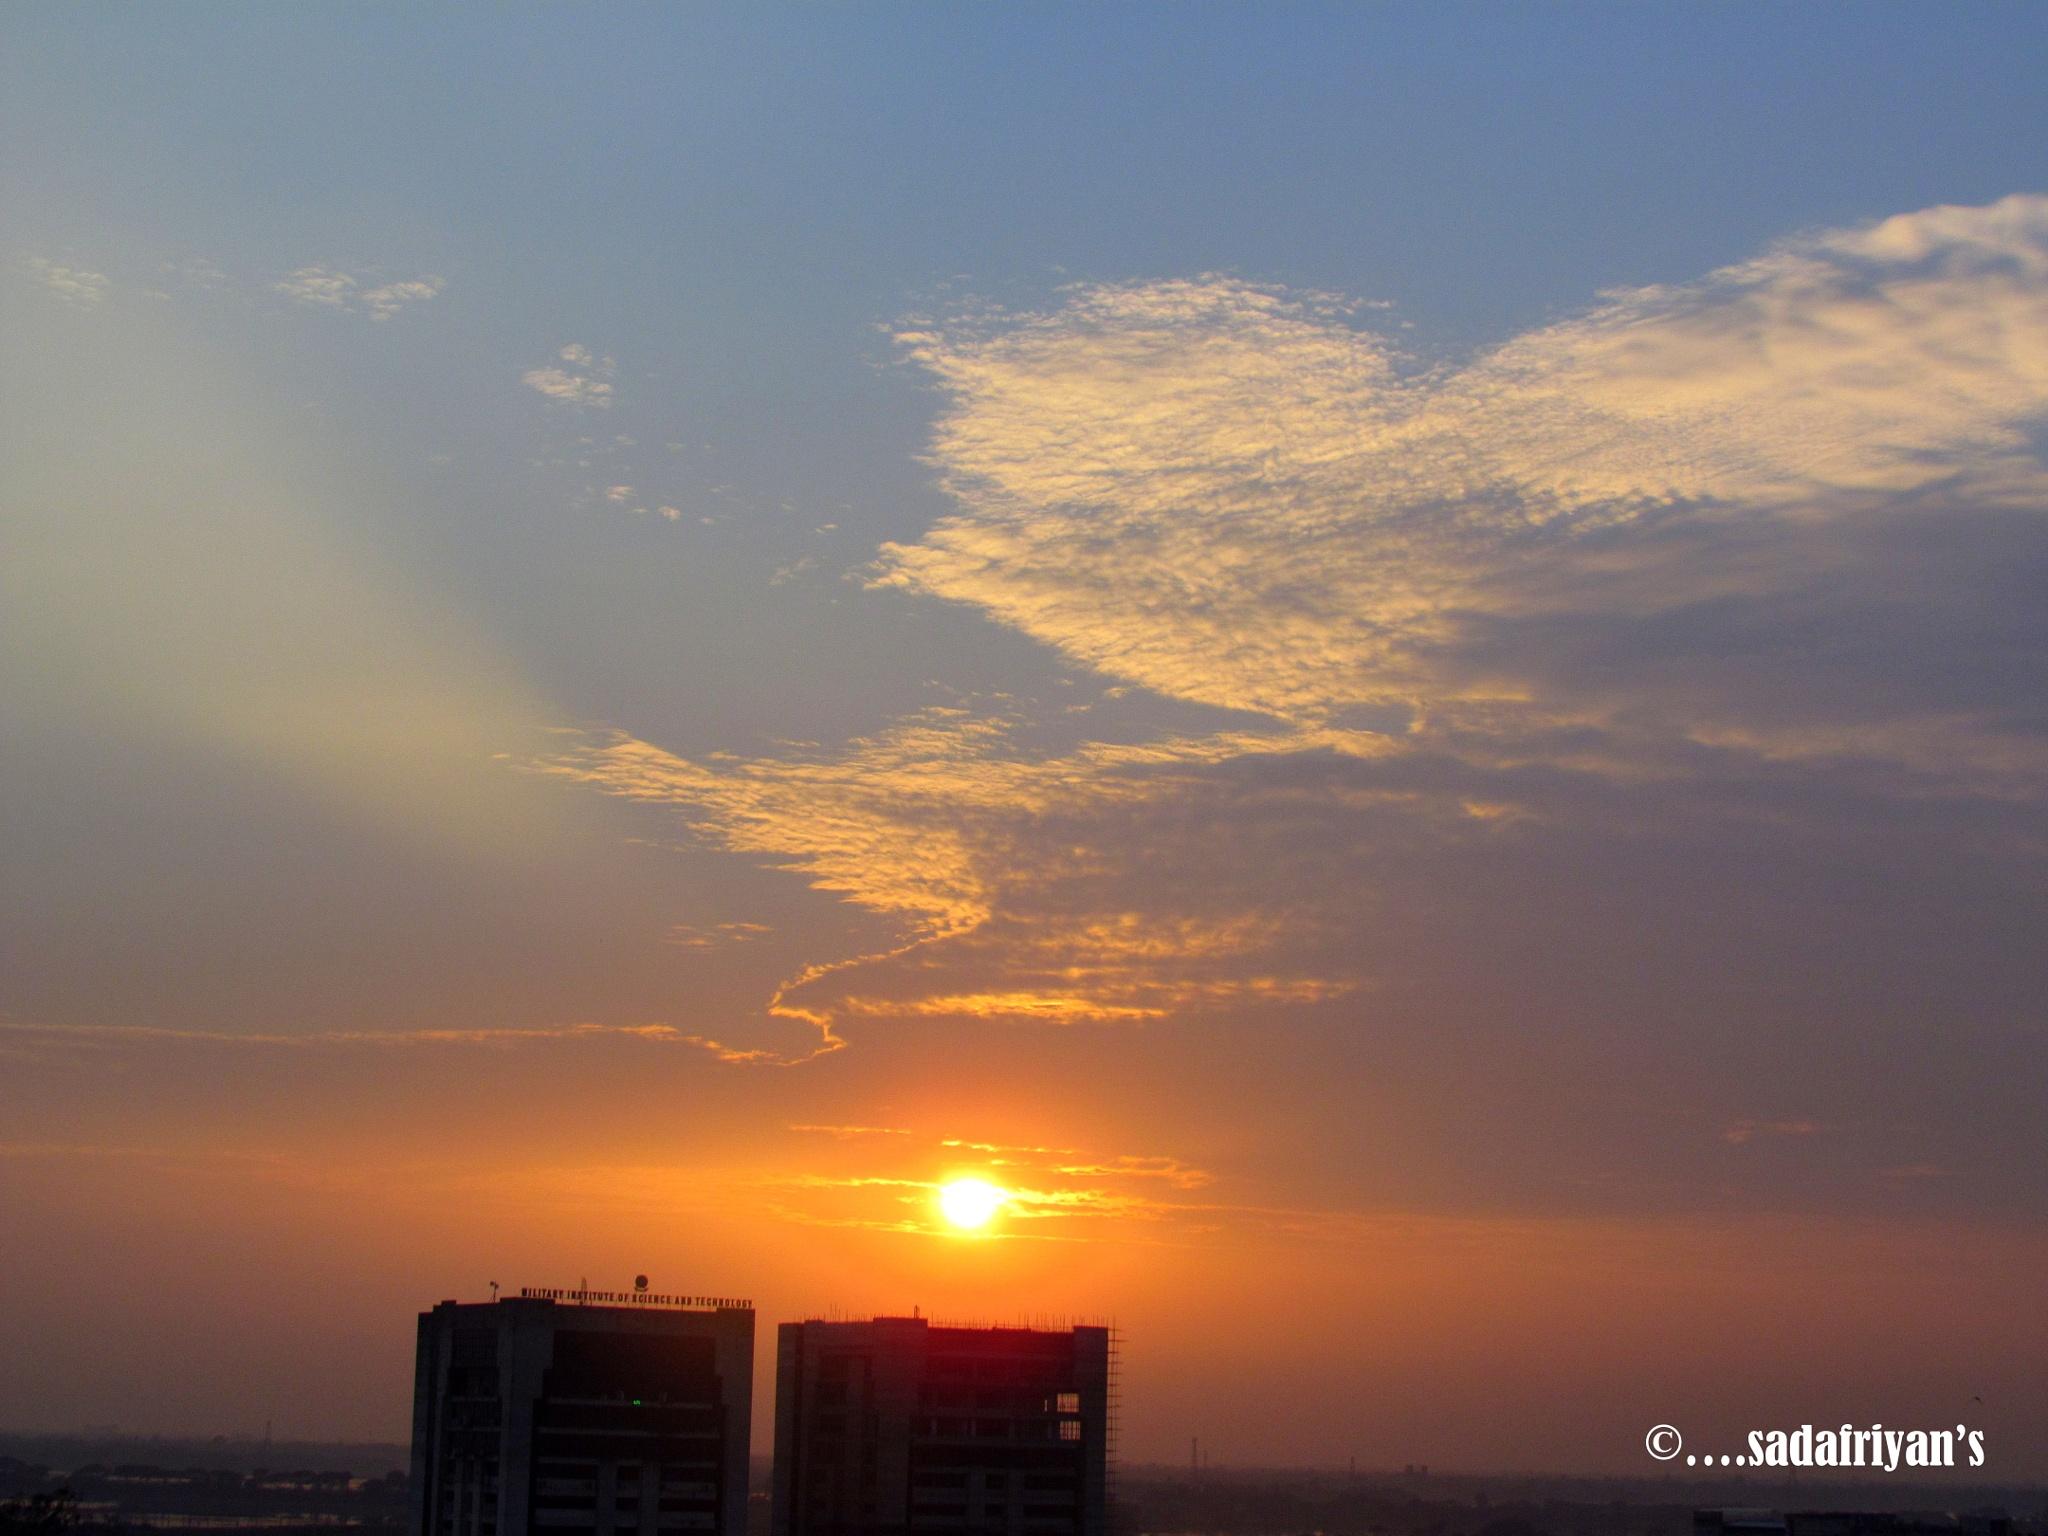 good afternoon by sadafriyan